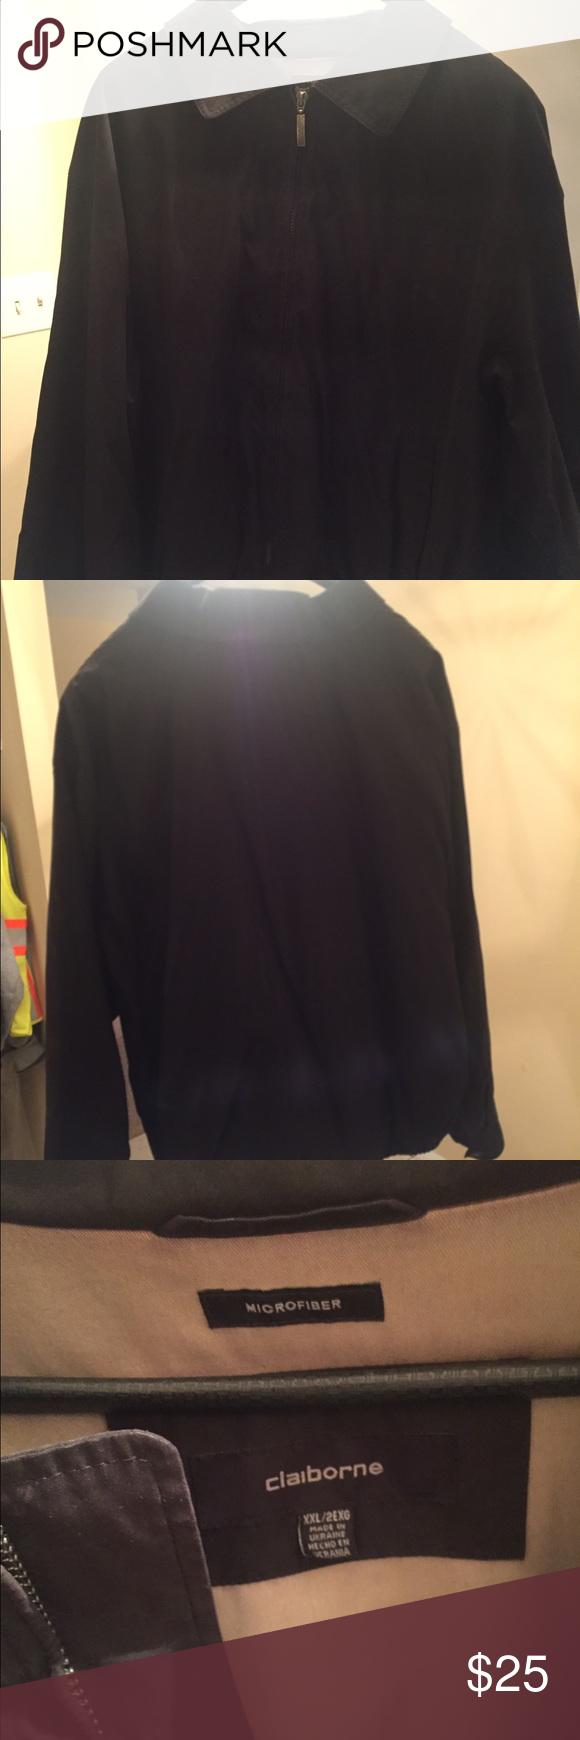 Black Claiborne Microfiber Jacket Black Claiborne Microfiber Jacket in excellent condition!  Size XXL Claiborne Jackets & Coats Lightweight & Shirt Jackets